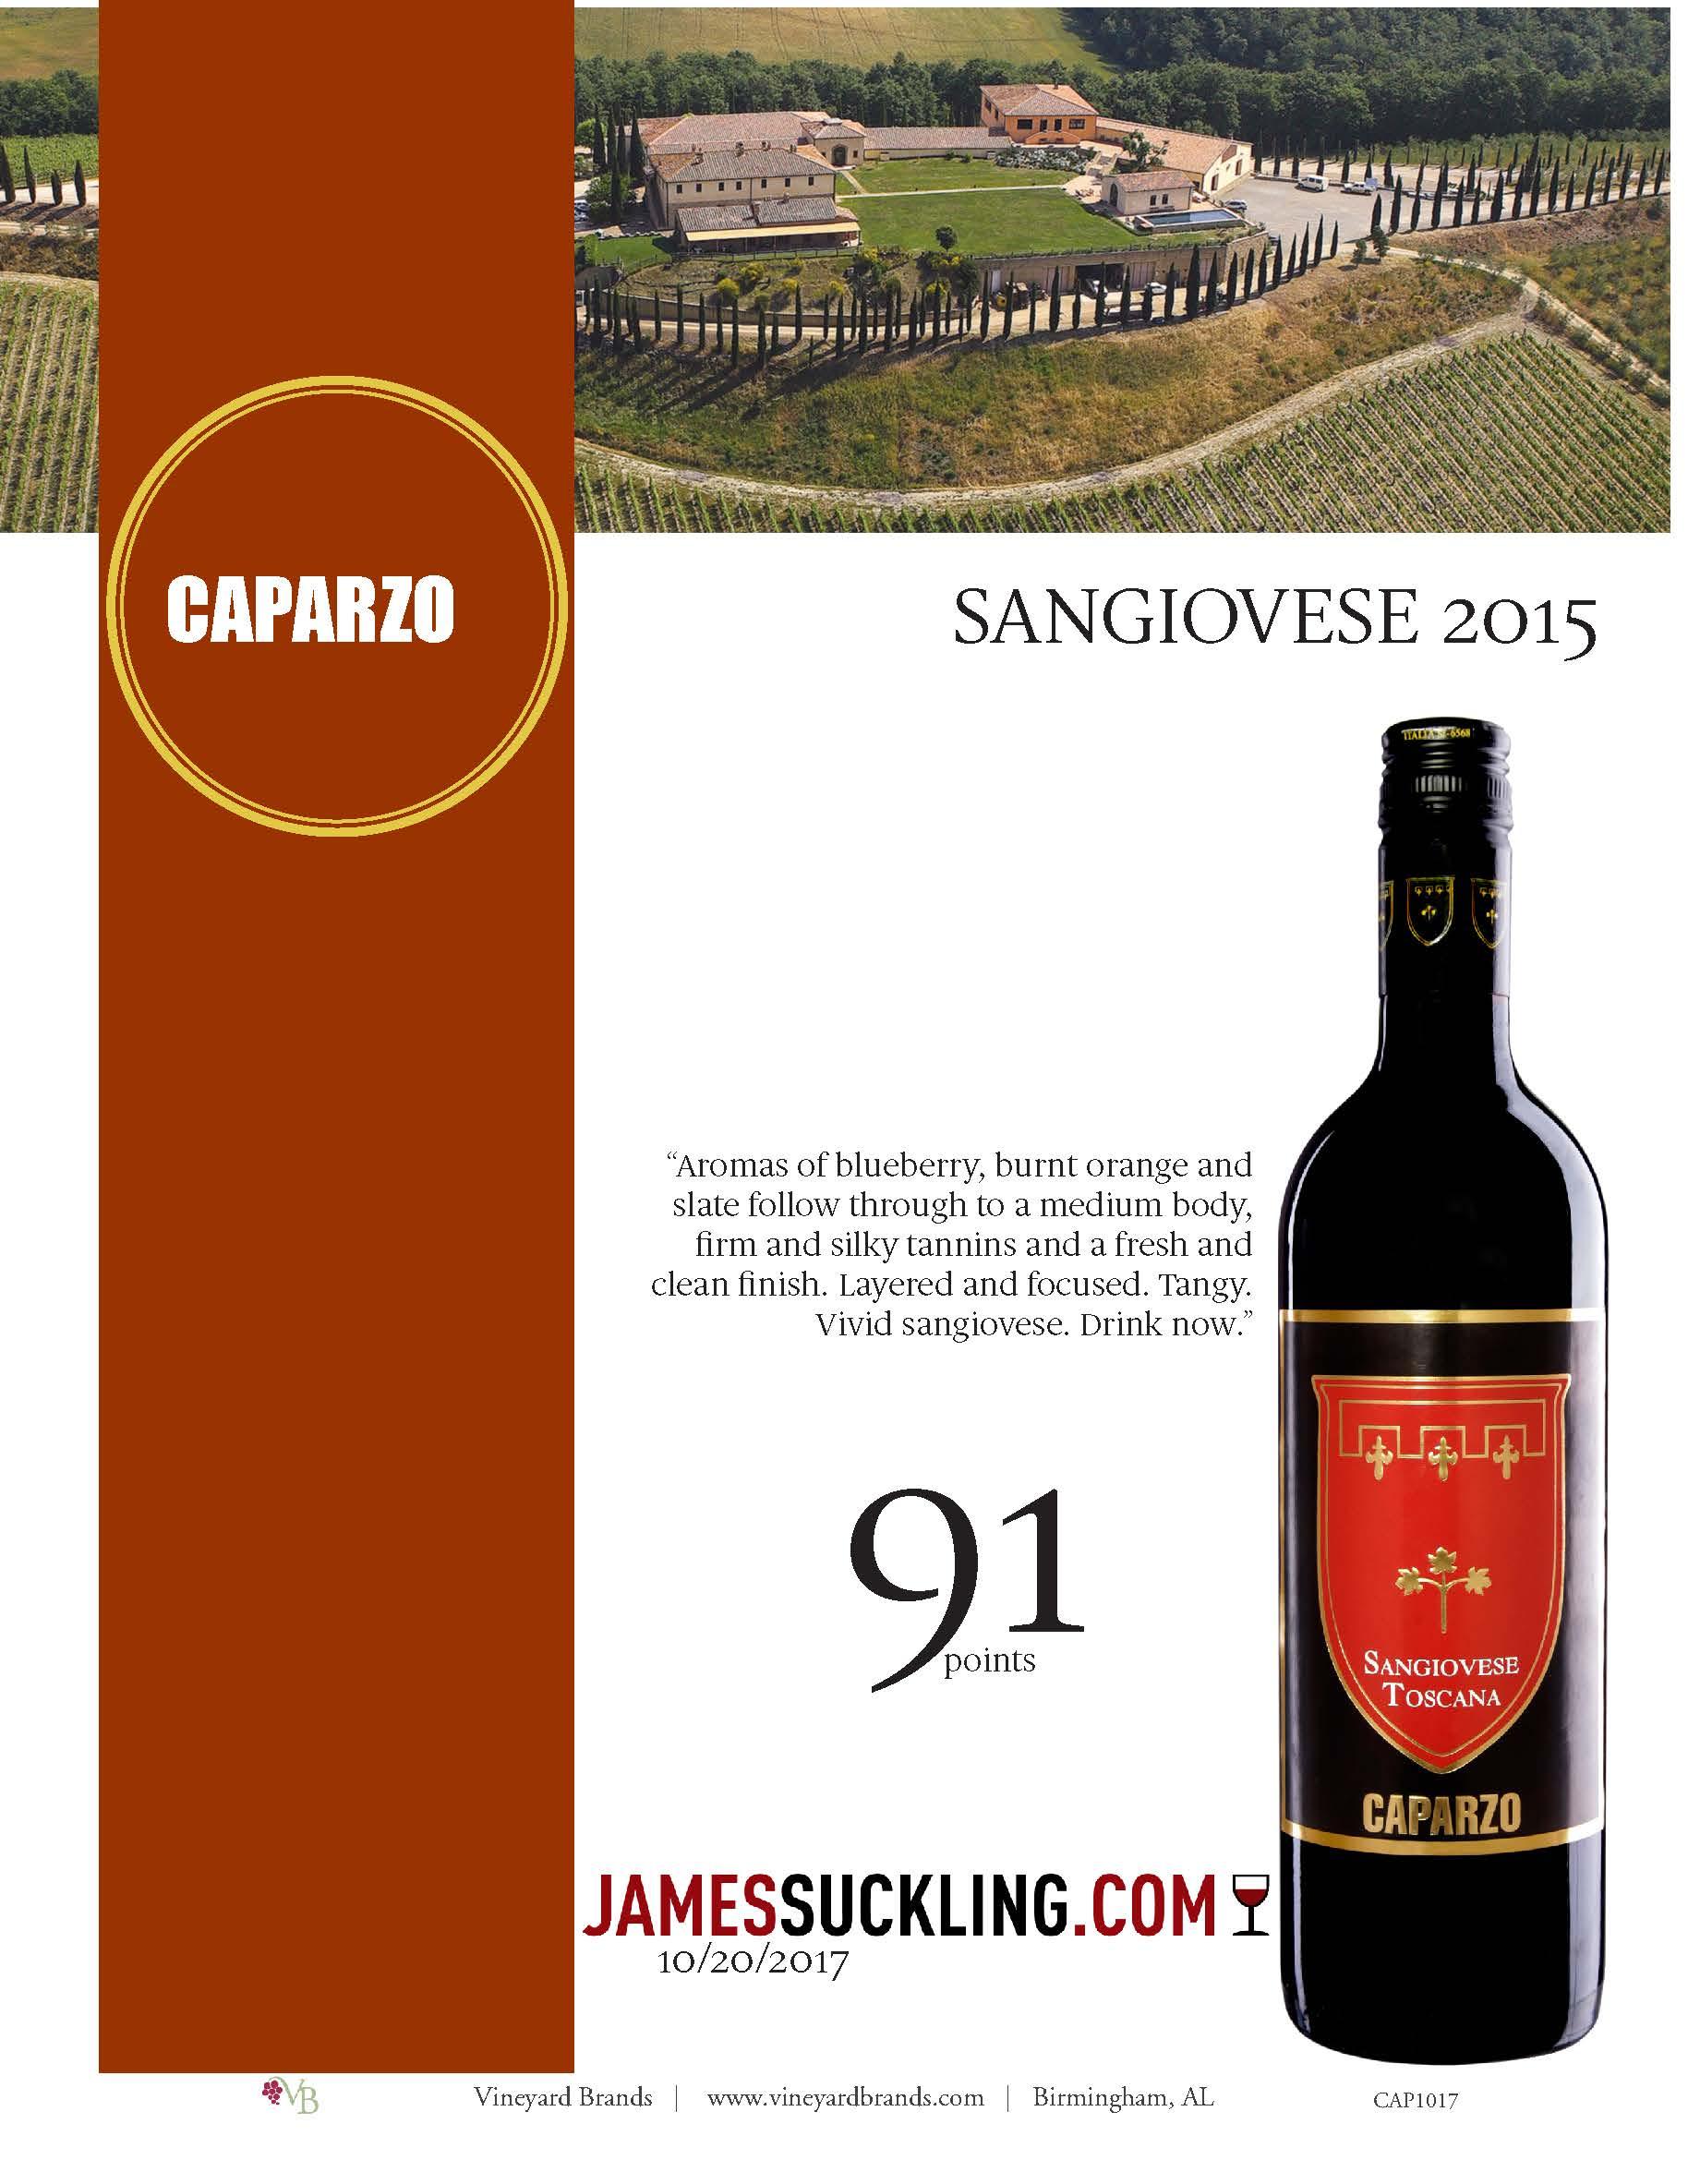 Caparzo Sangiovese 2015.jpg